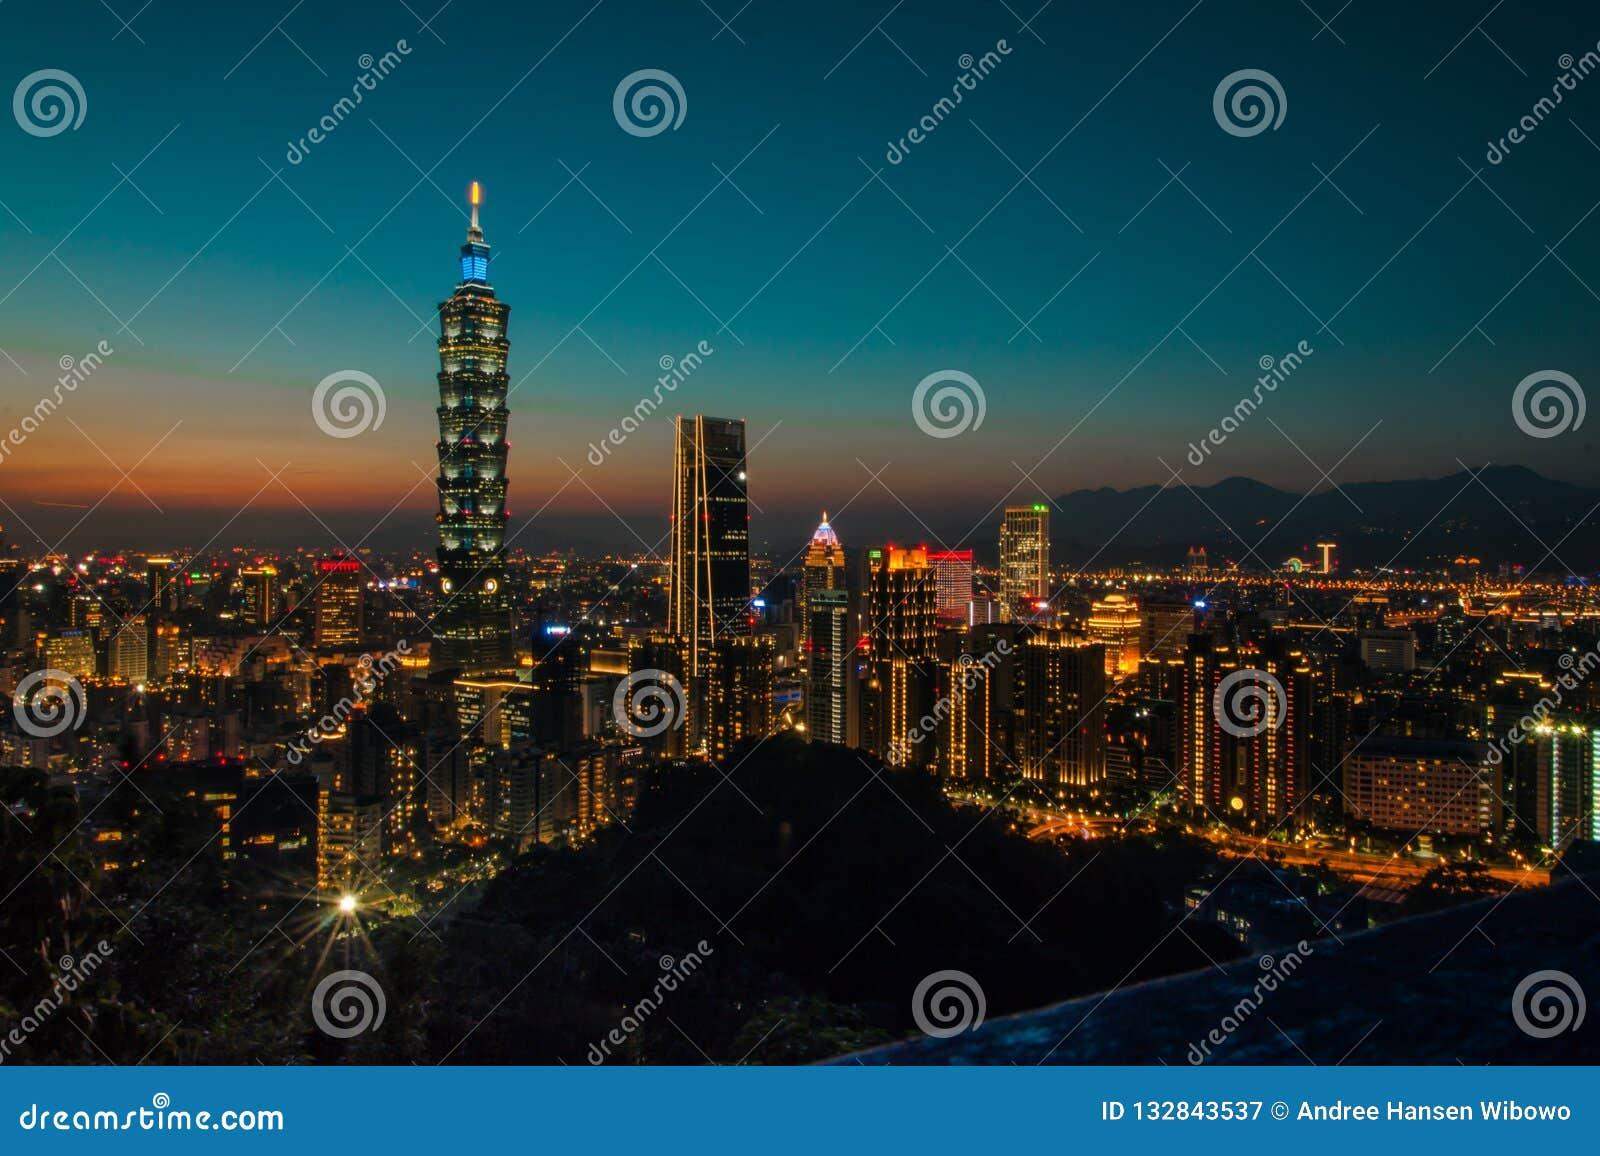 Night View of the Brightly Lit Cityline of Taipei, Taiwan